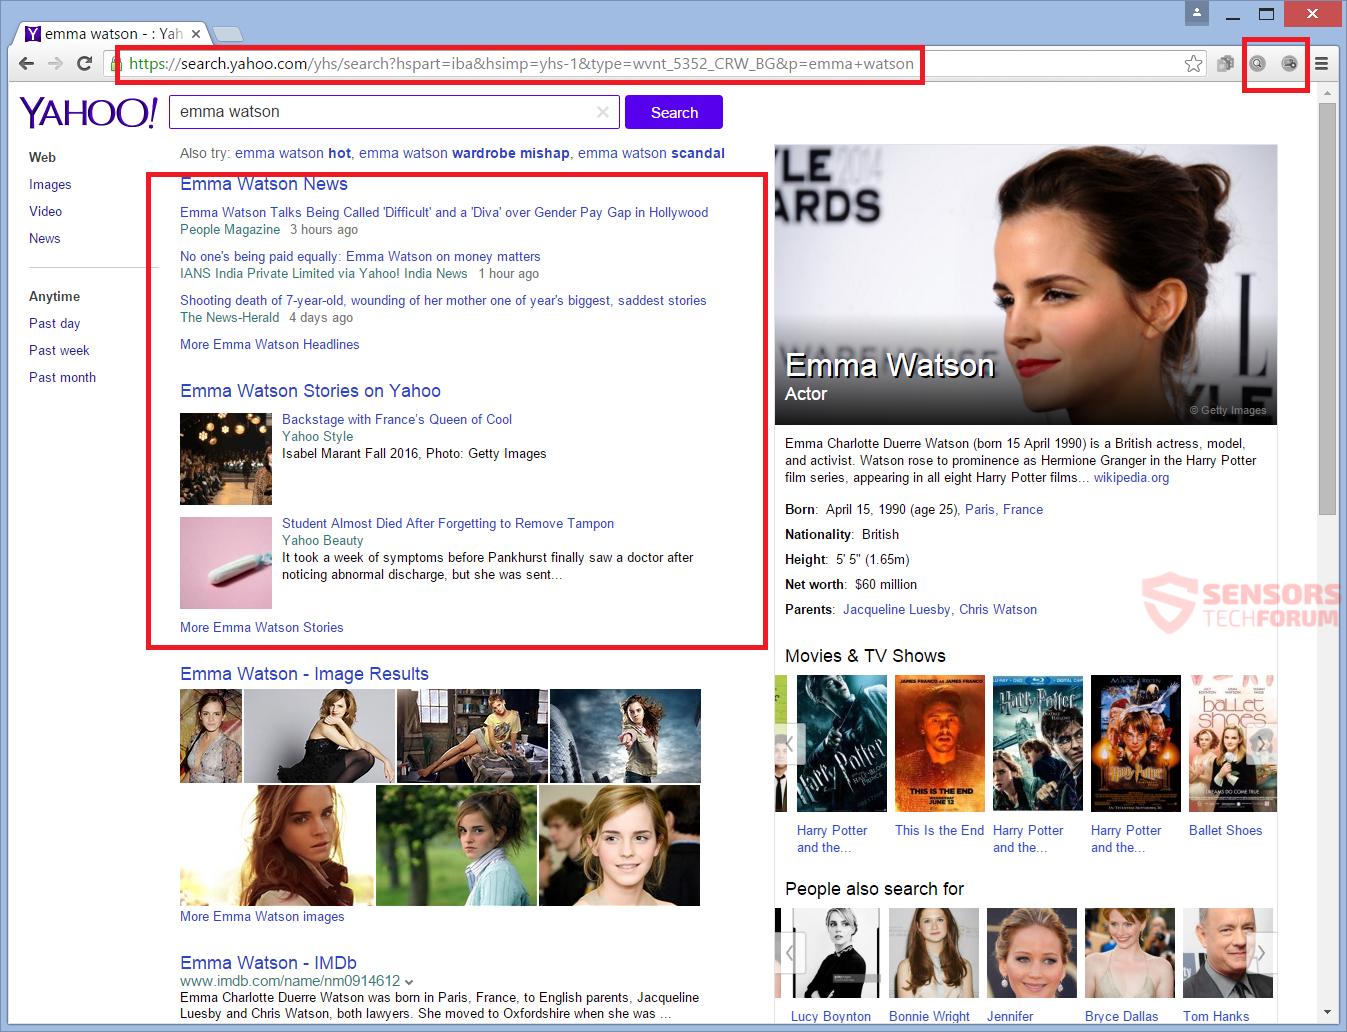 STF-goamuze-com-go-amuze-a-muze-ads-searchalgo-com-search-algo-emma-watson-search-results